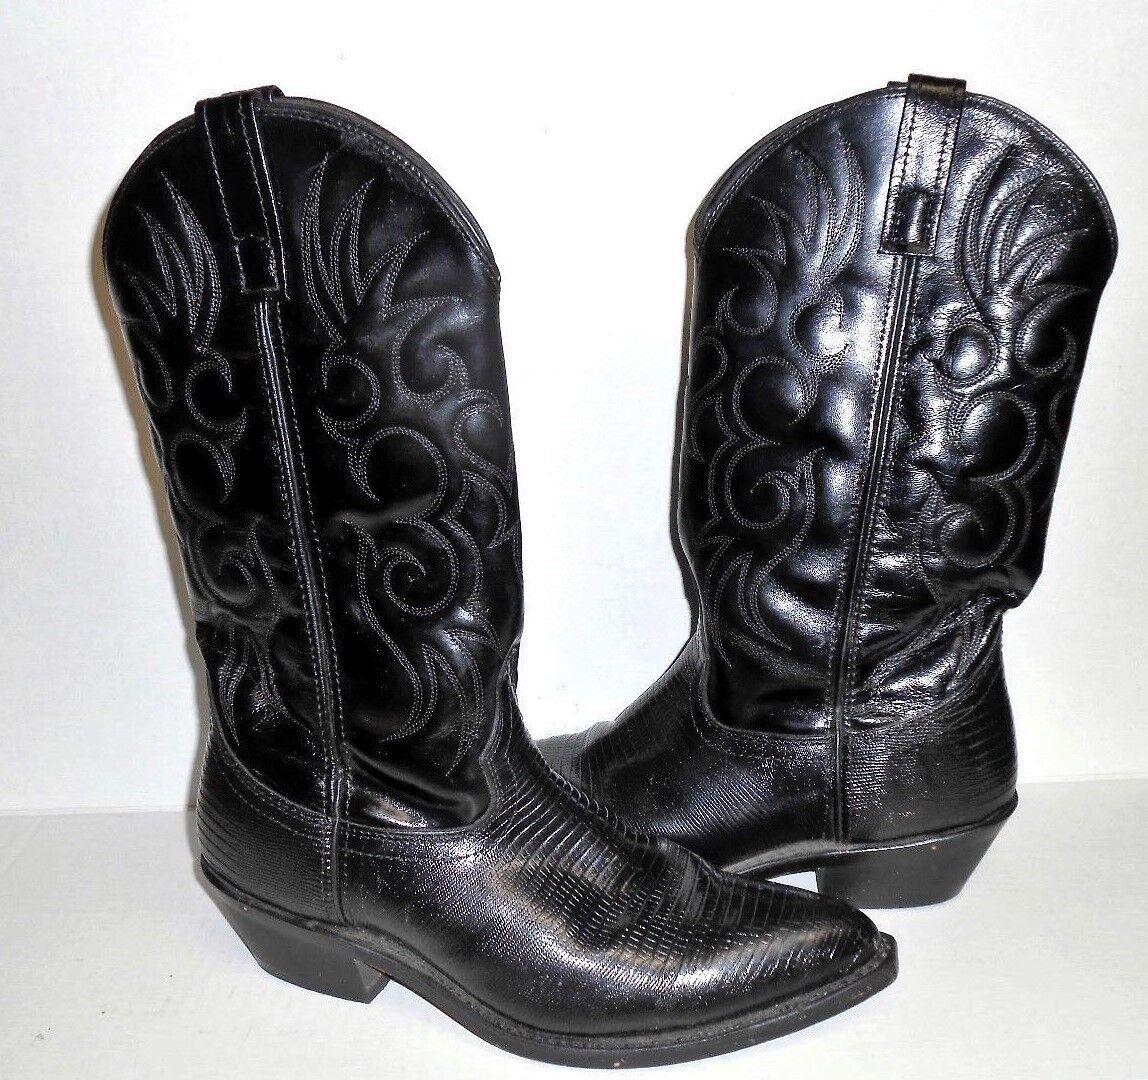 Men's Larossoo stivali Dimensione 9 Western nero Leather Cowboy - 68085